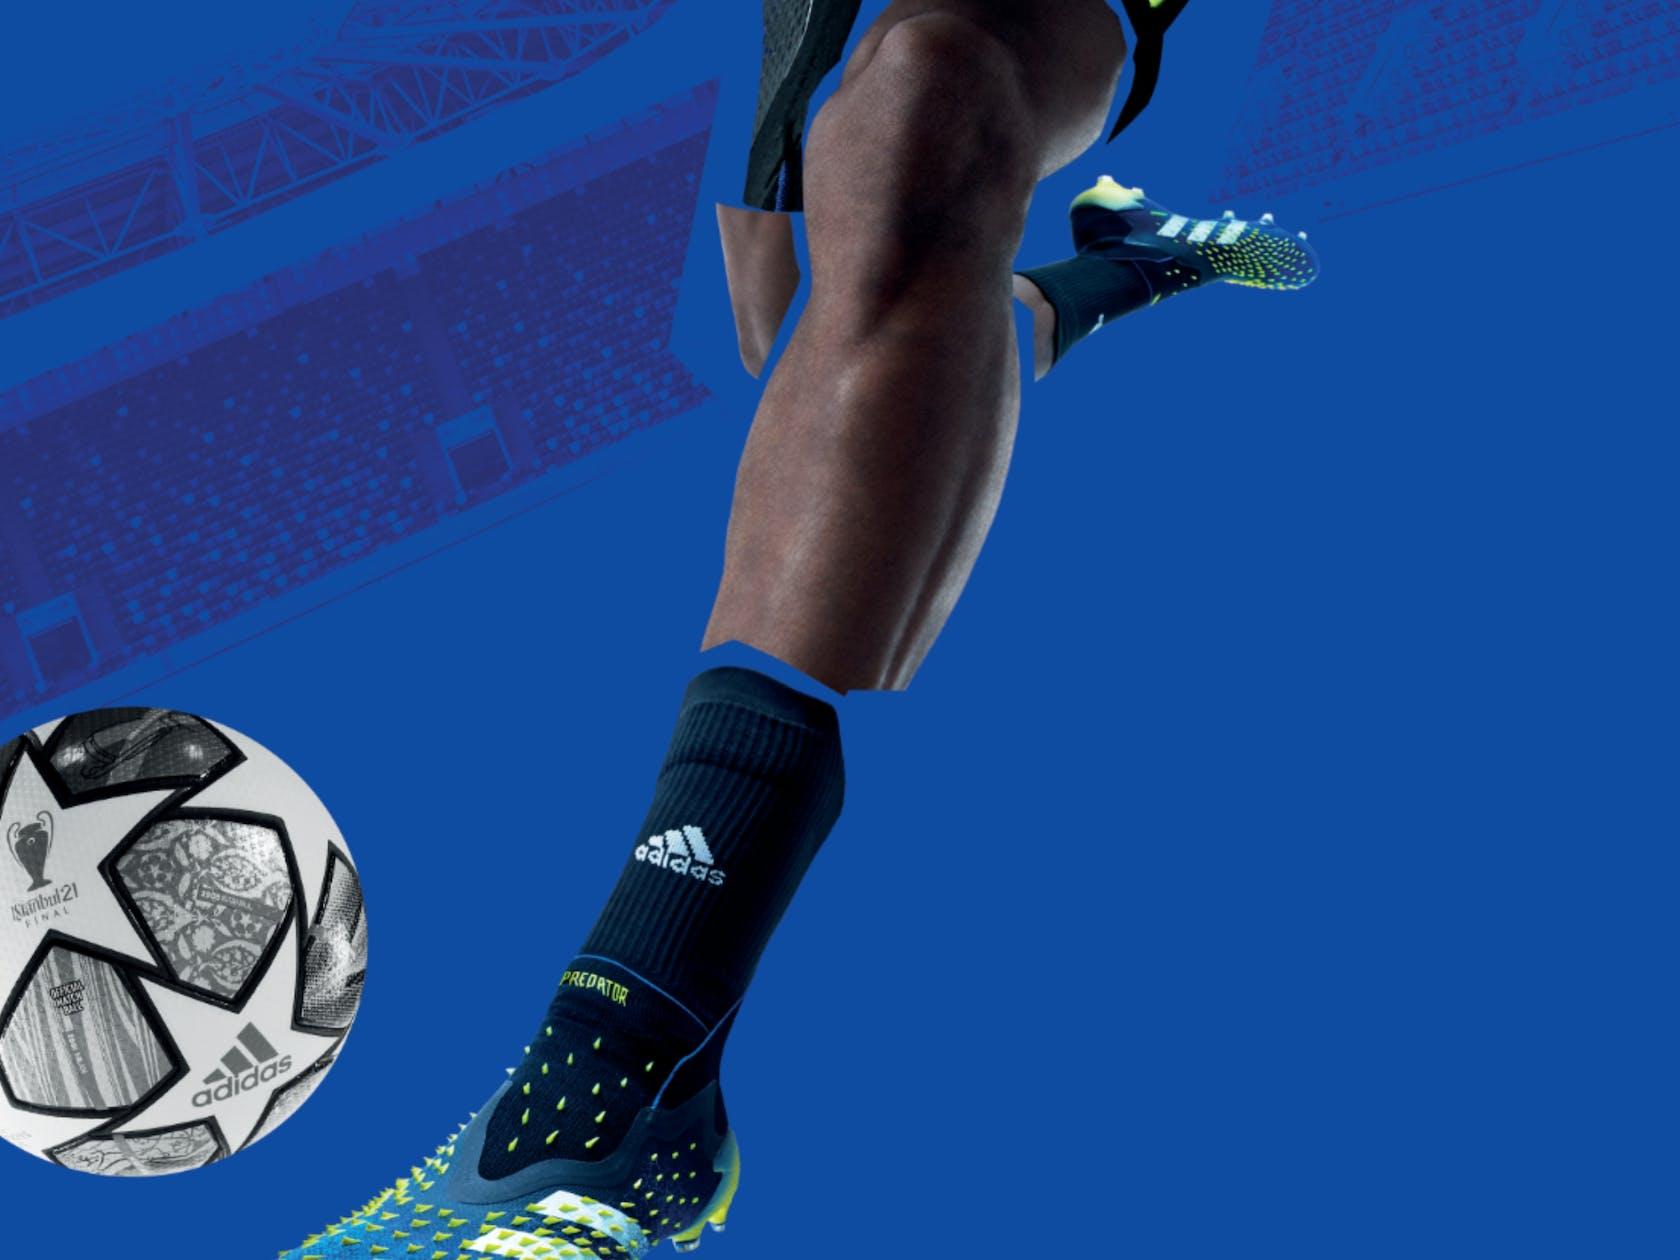 ADIDAS FUSSBALL Onlineshop